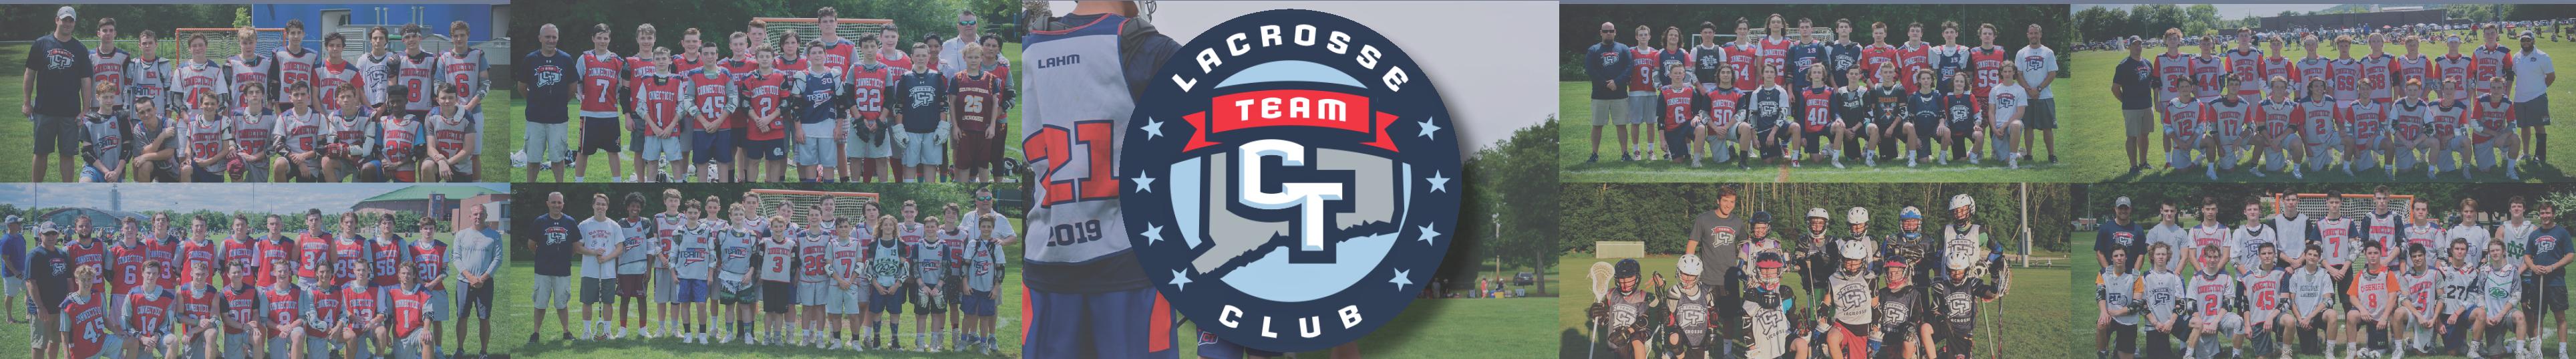 TEAM CONNECTICUT LACROSSE CLUB, Lacrosse, Goal, Field